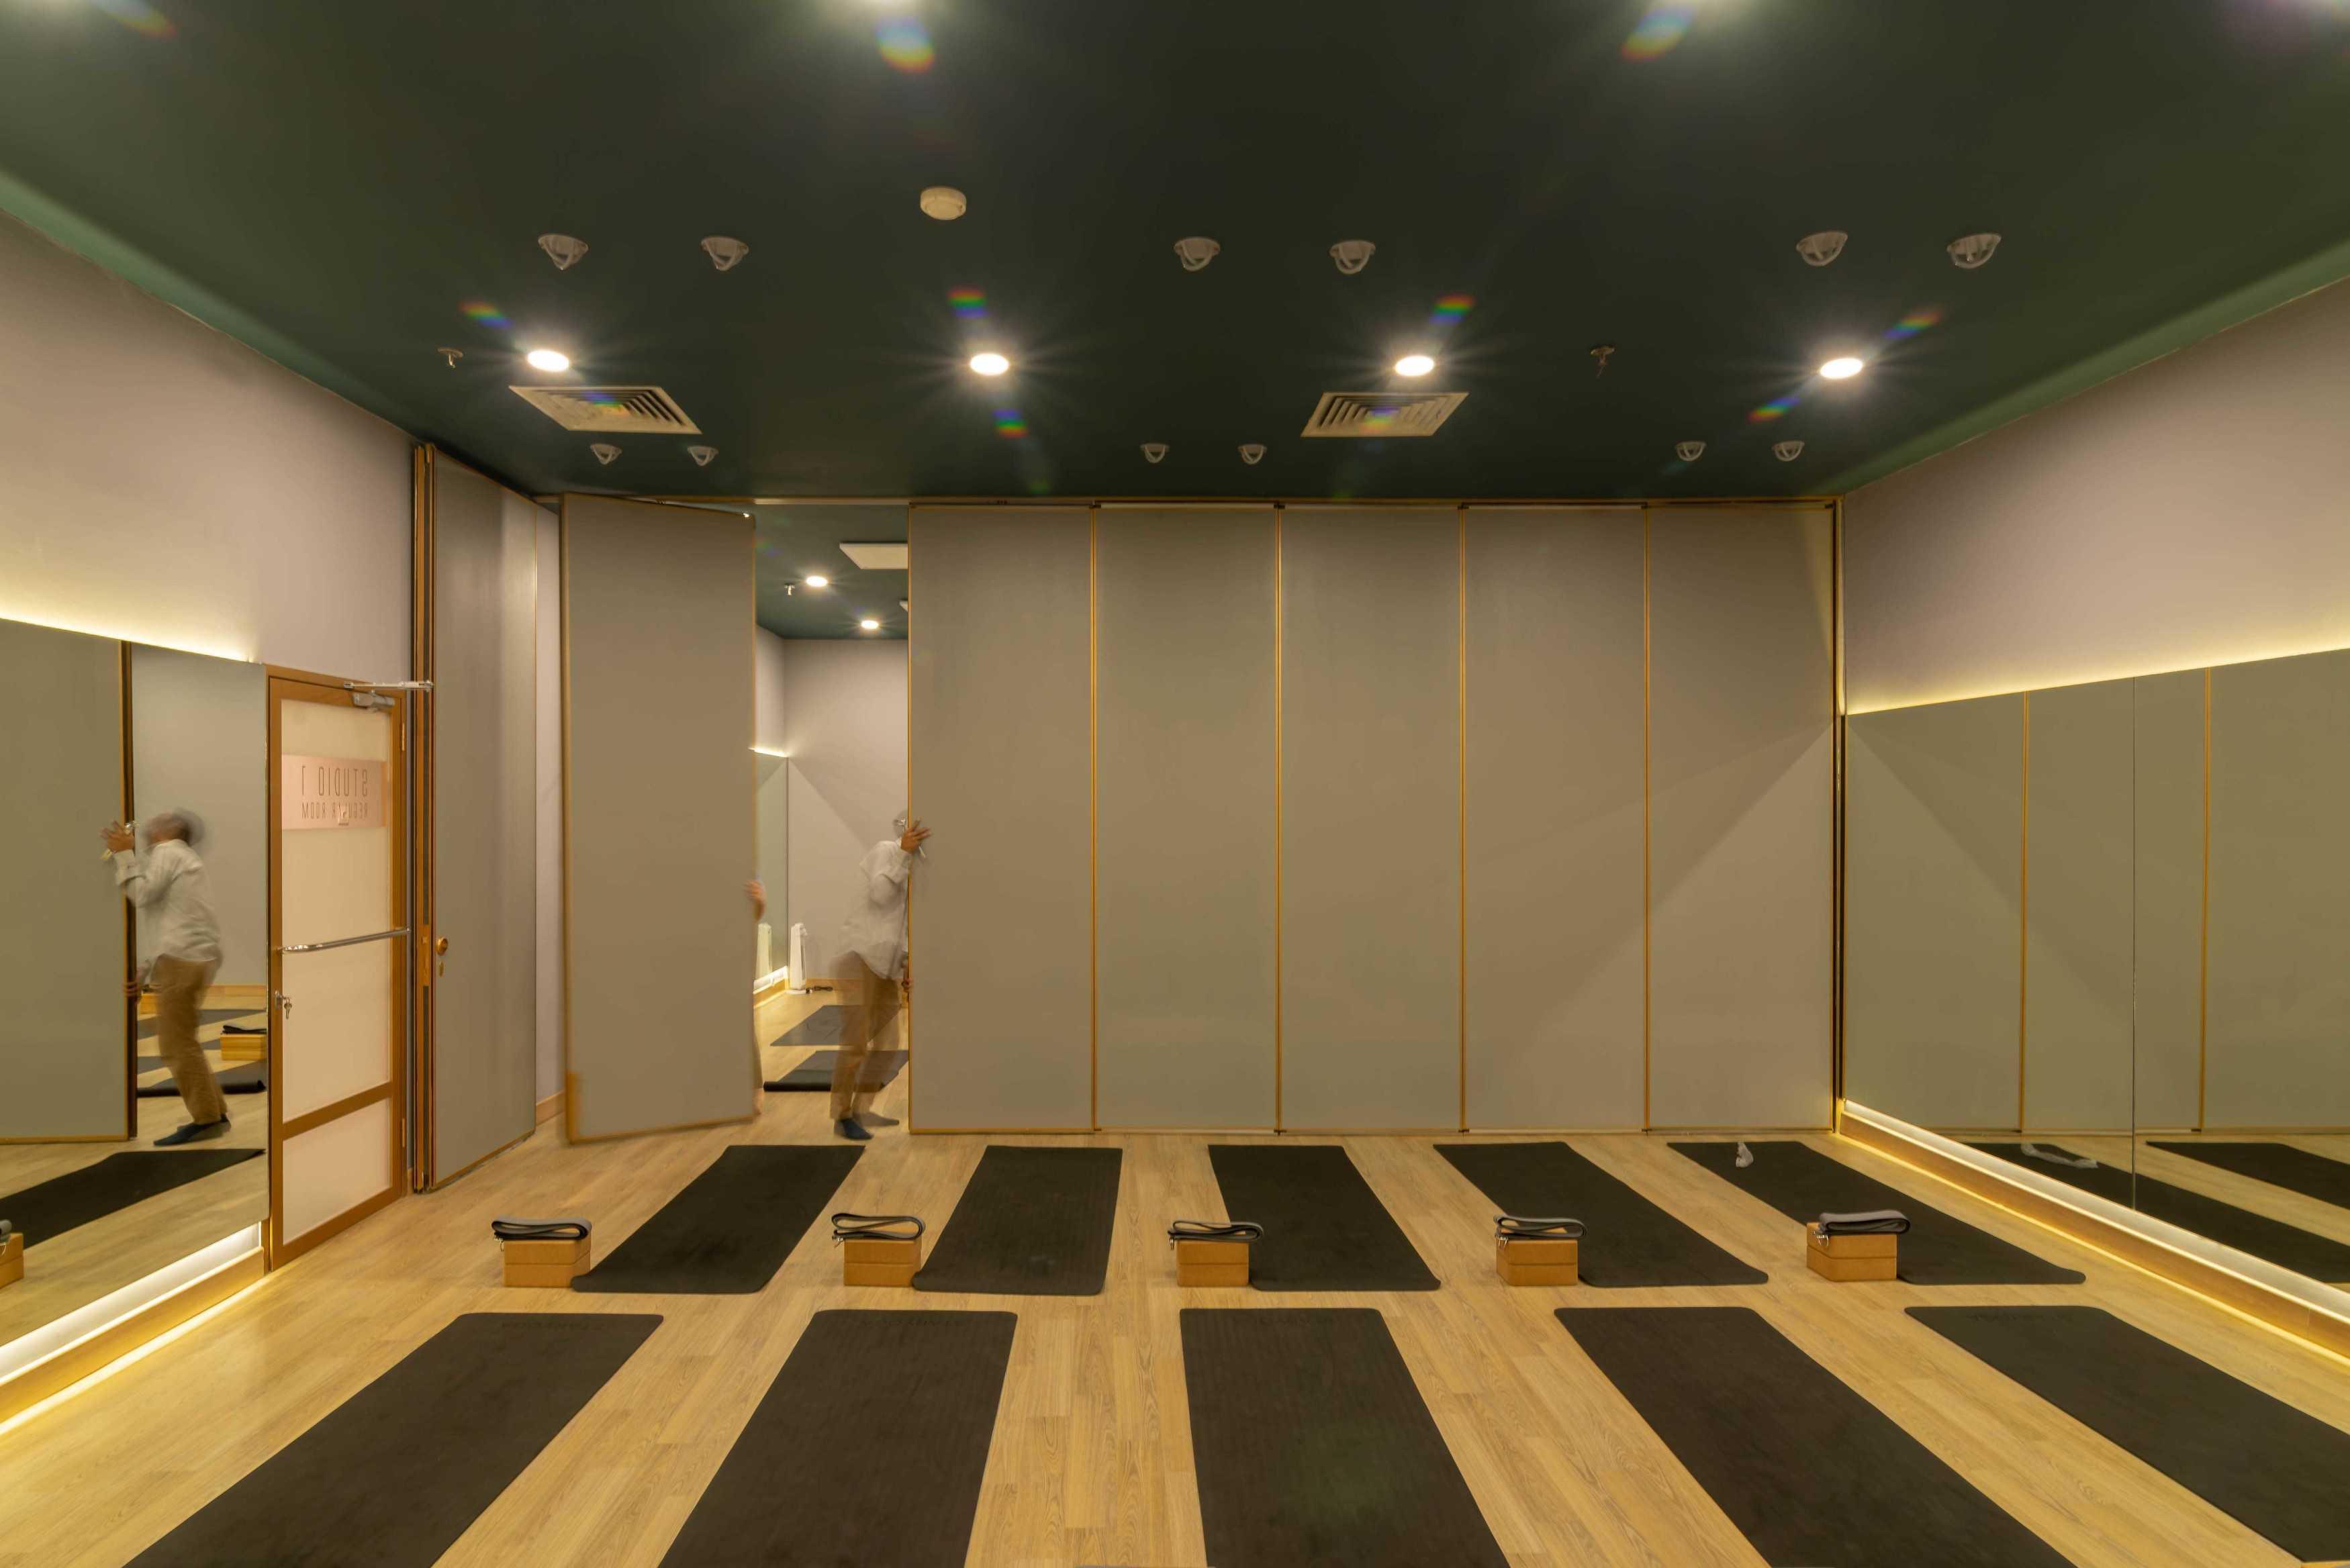 Archid Design&build Star Yoga Kec. Klp. Gading, Kota Jkt Utara, Daerah Khusus Ibukota Jakarta, Indonesia Kec. Klp. Gading, Kota Jkt Utara, Daerah Khusus Ibukota Jakarta, Indonesia Archid-Design-Build-Star-Yoga   88013